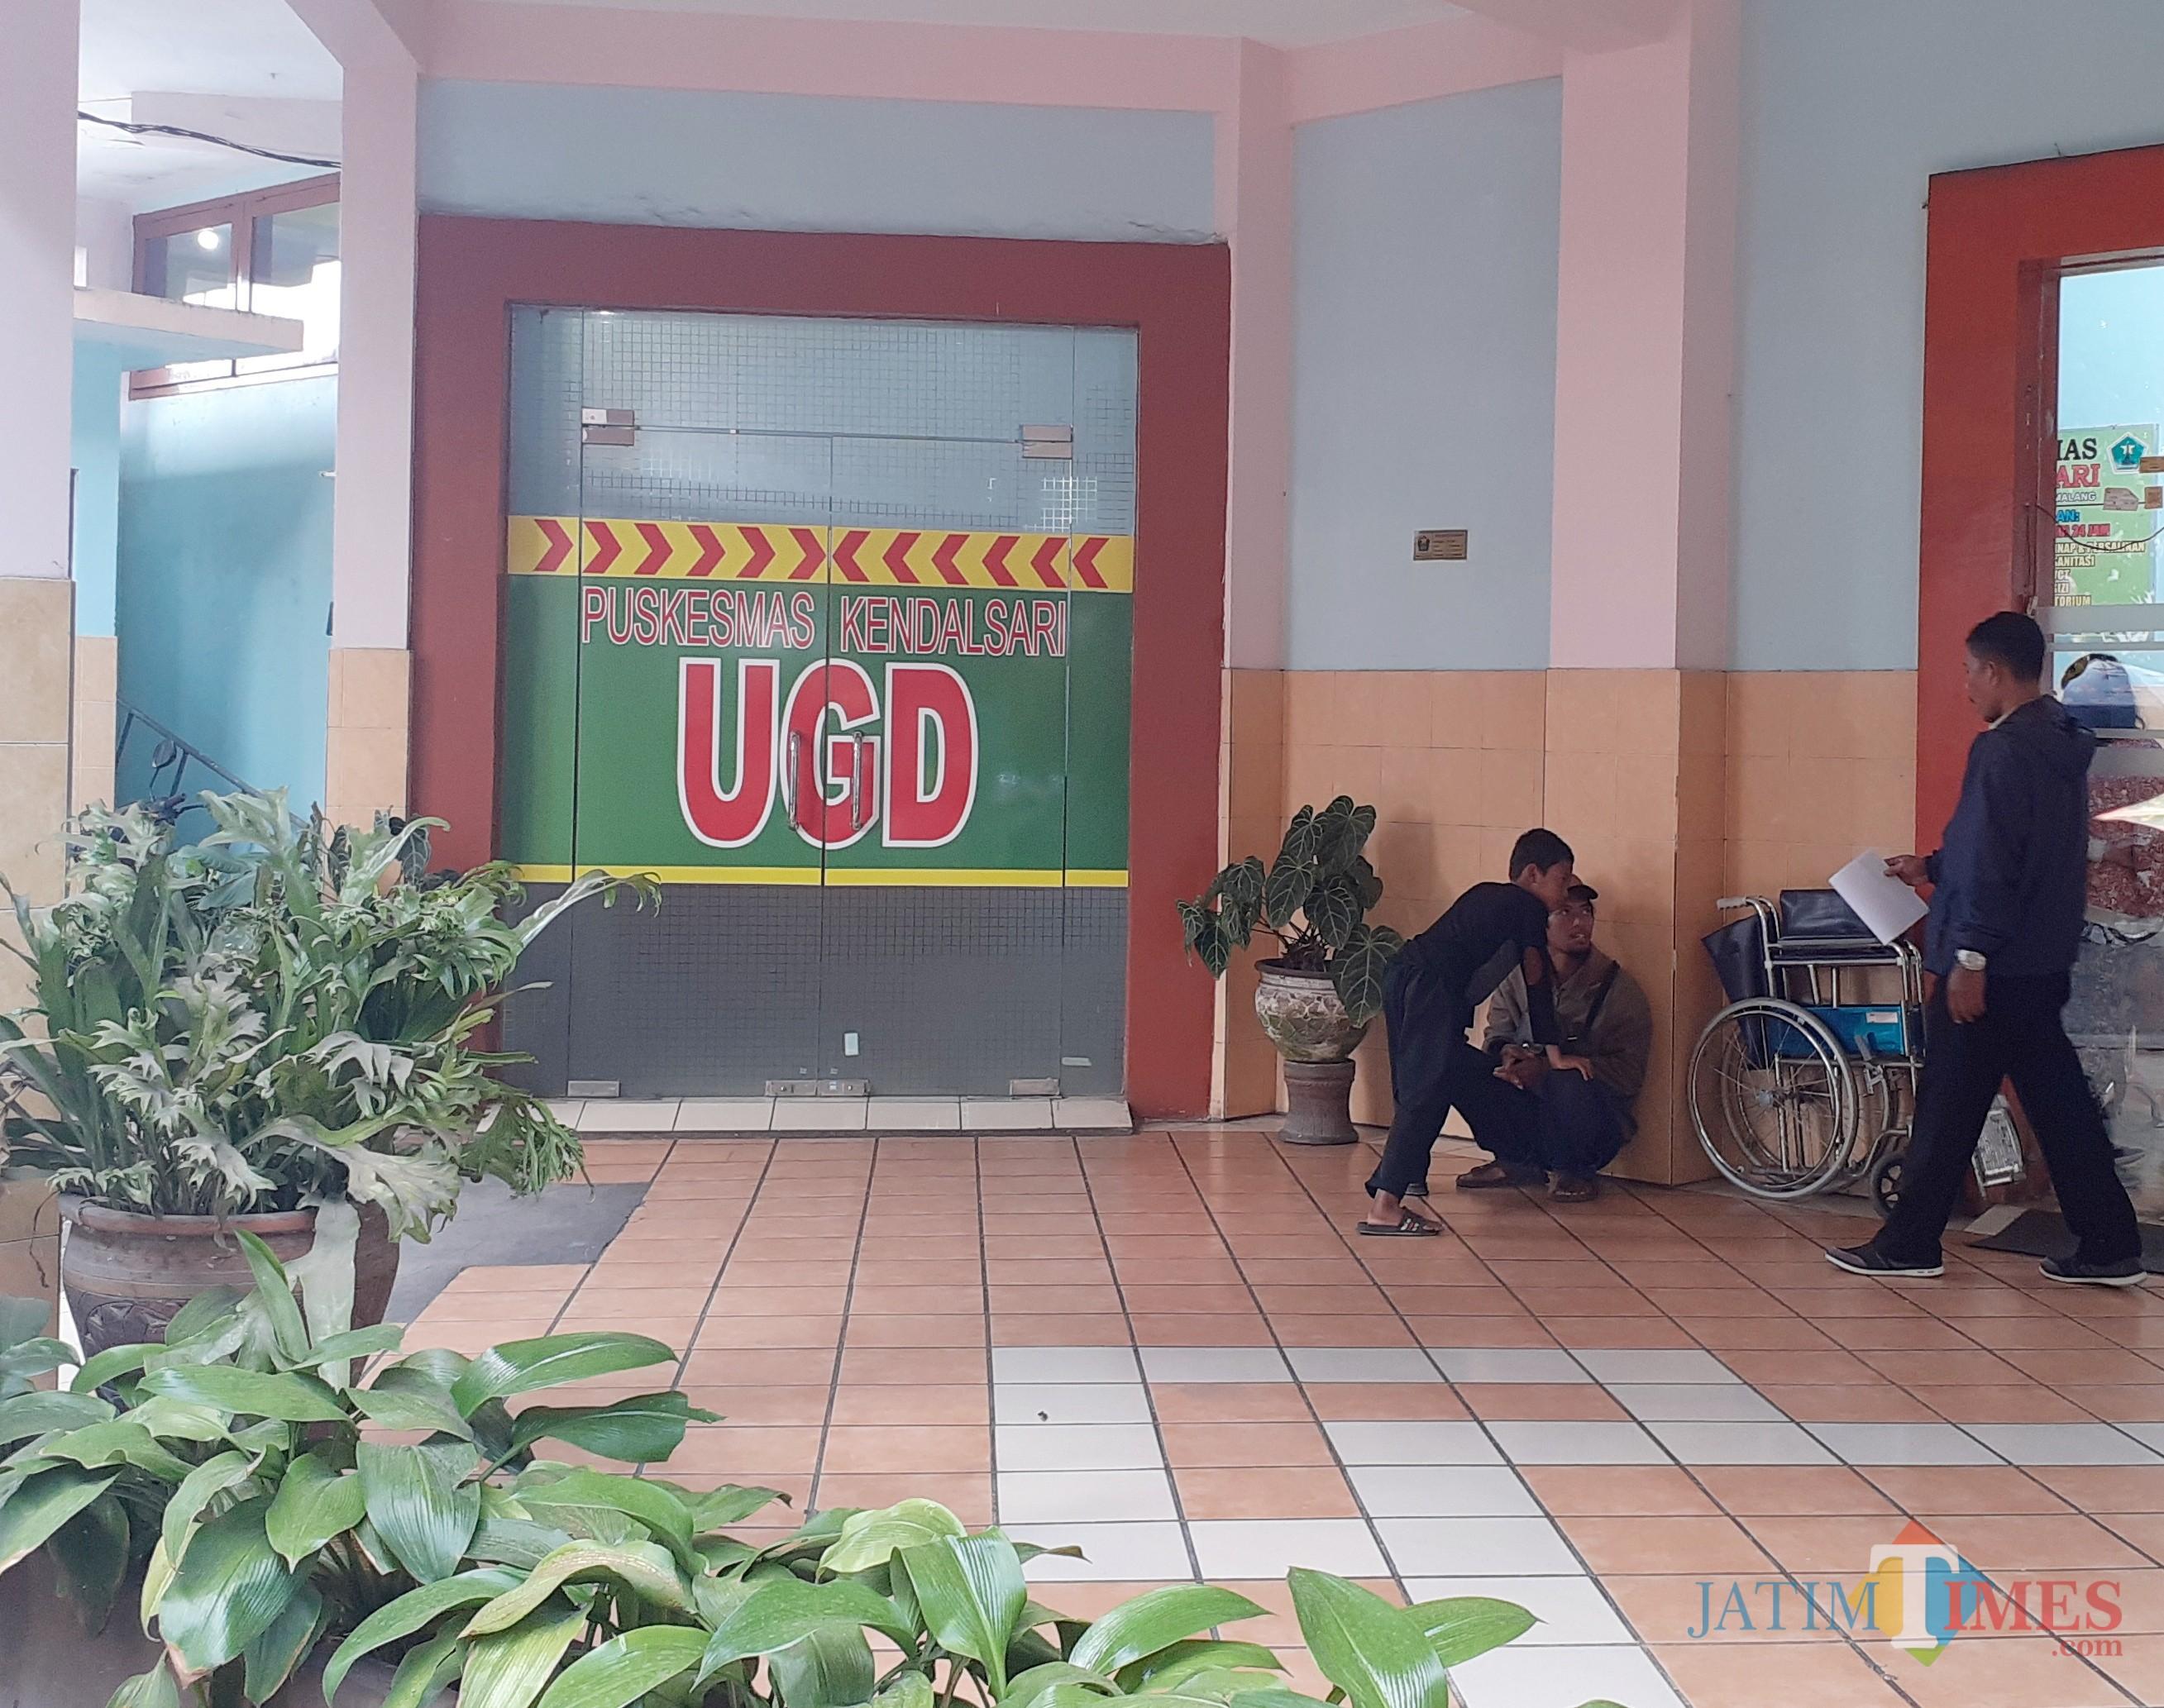 Suasana layanan kesehatan di Puskesmas Kendalsari (Arifina Cahyanti Firdausi/MalangTIMES)